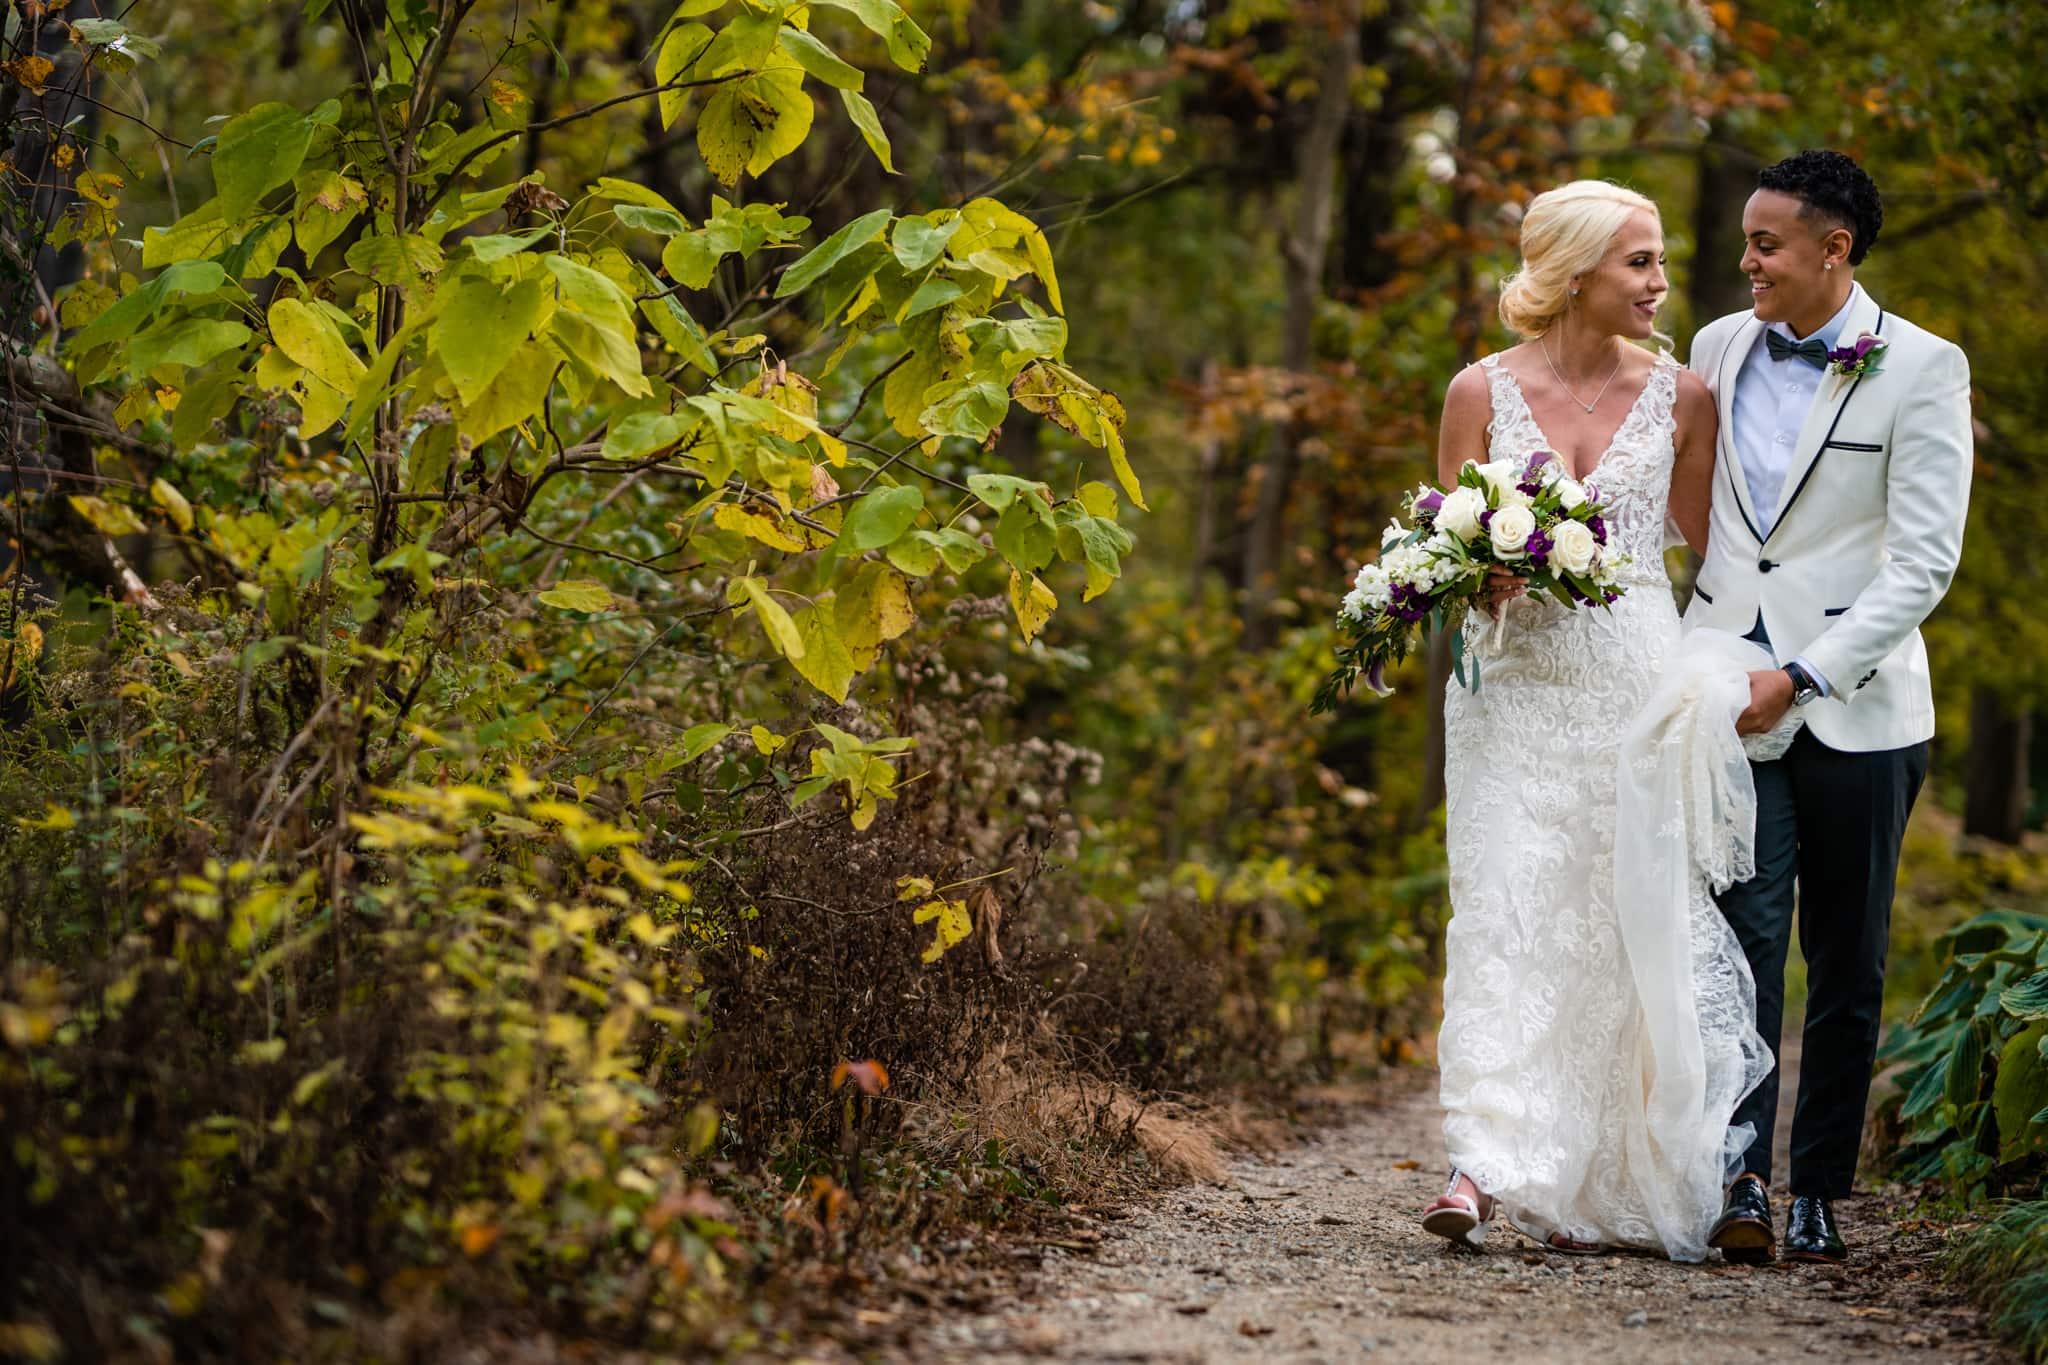 Two brides walk along autumn garden path on wedding day